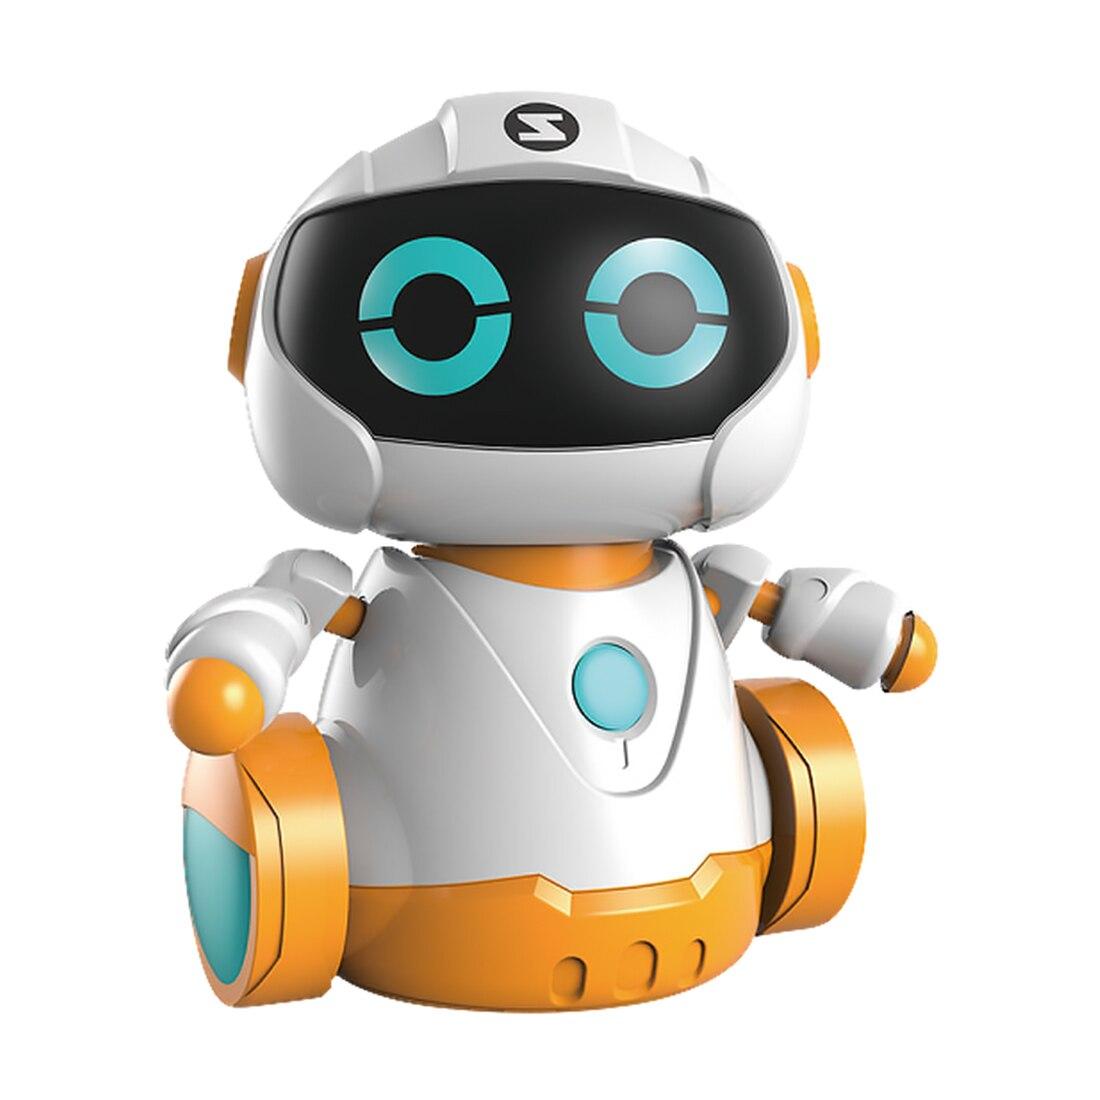 Children Programmable Follow Any Drawn Line Magic Marker Pen Inductive Sensing Robot - Caterpillar / Wheel Type High Tech Toys